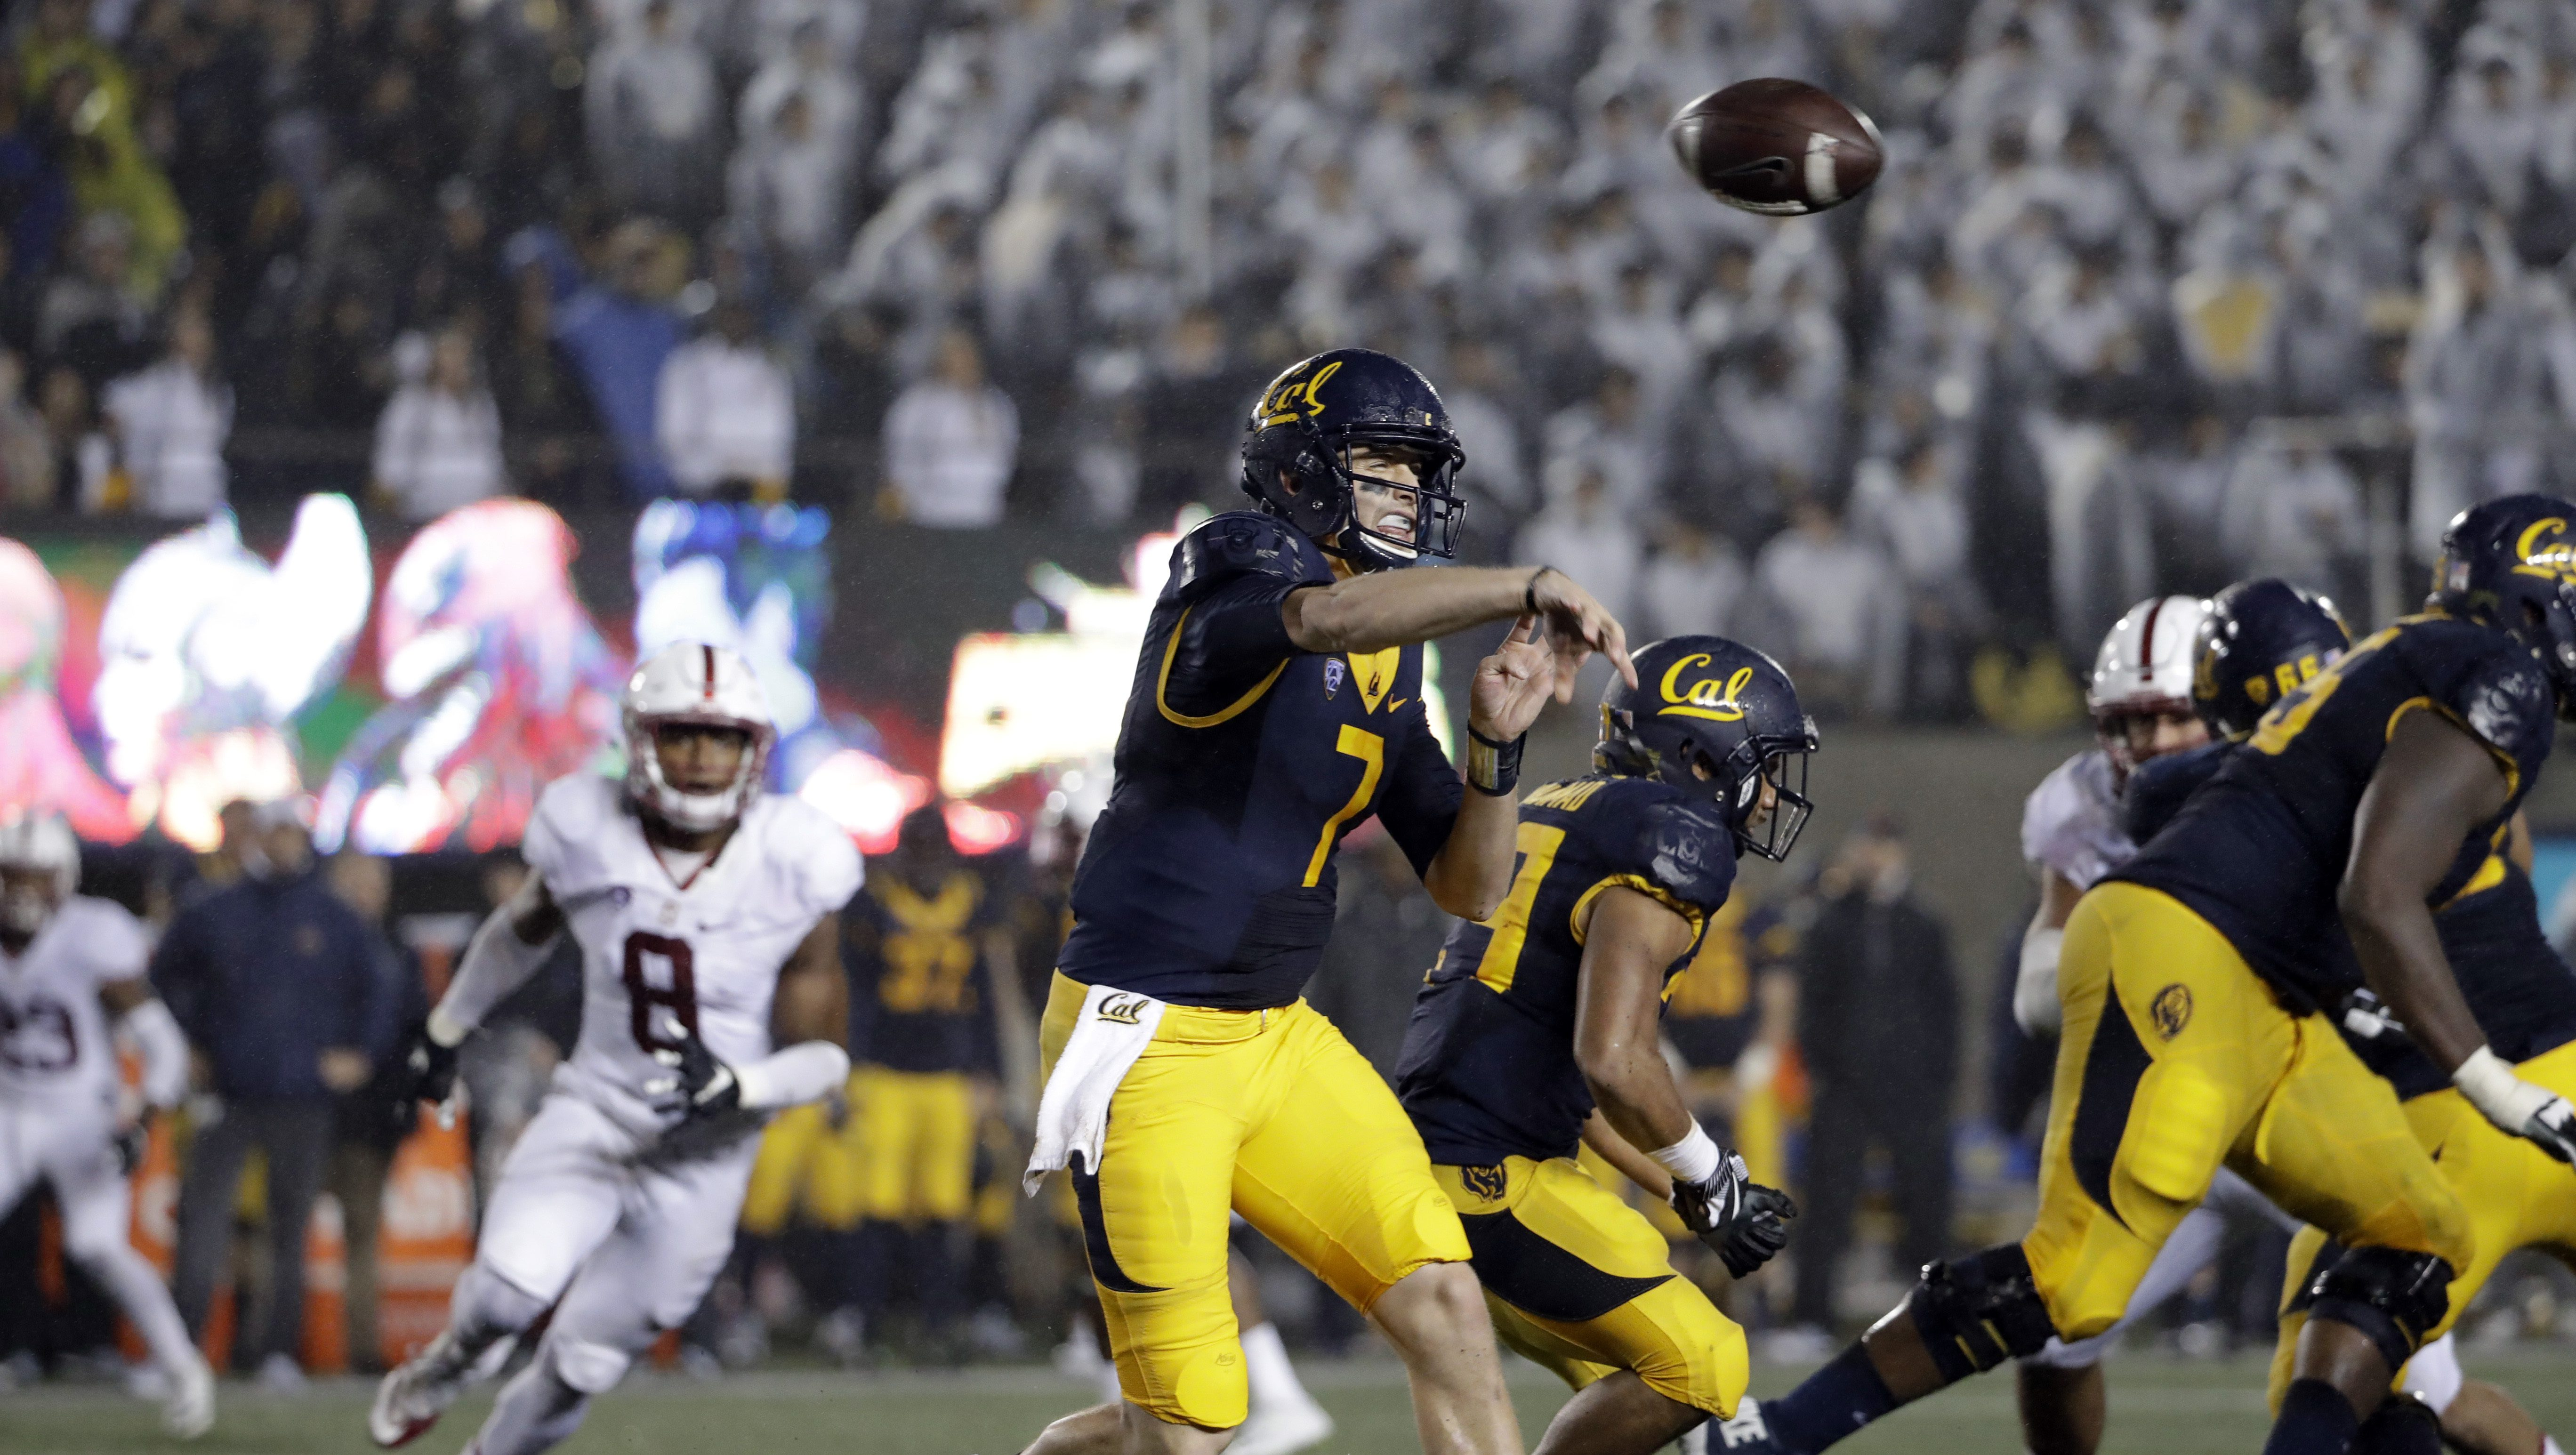 California quarterback Davis Webb (7) during an NCAA college football game against Stanford Saturday, Nov. 19, 2016, in Berkeley, Calif. (AP Photo/Marcio Jose Sanchez)